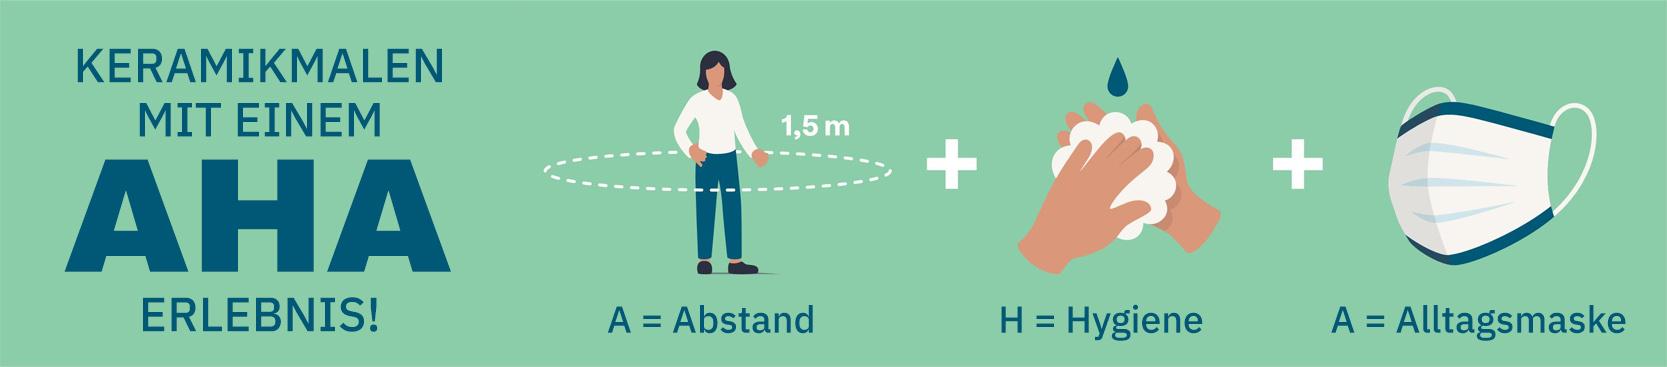 AHA Grafik Abstand halten Hygiene Alltagsmaske